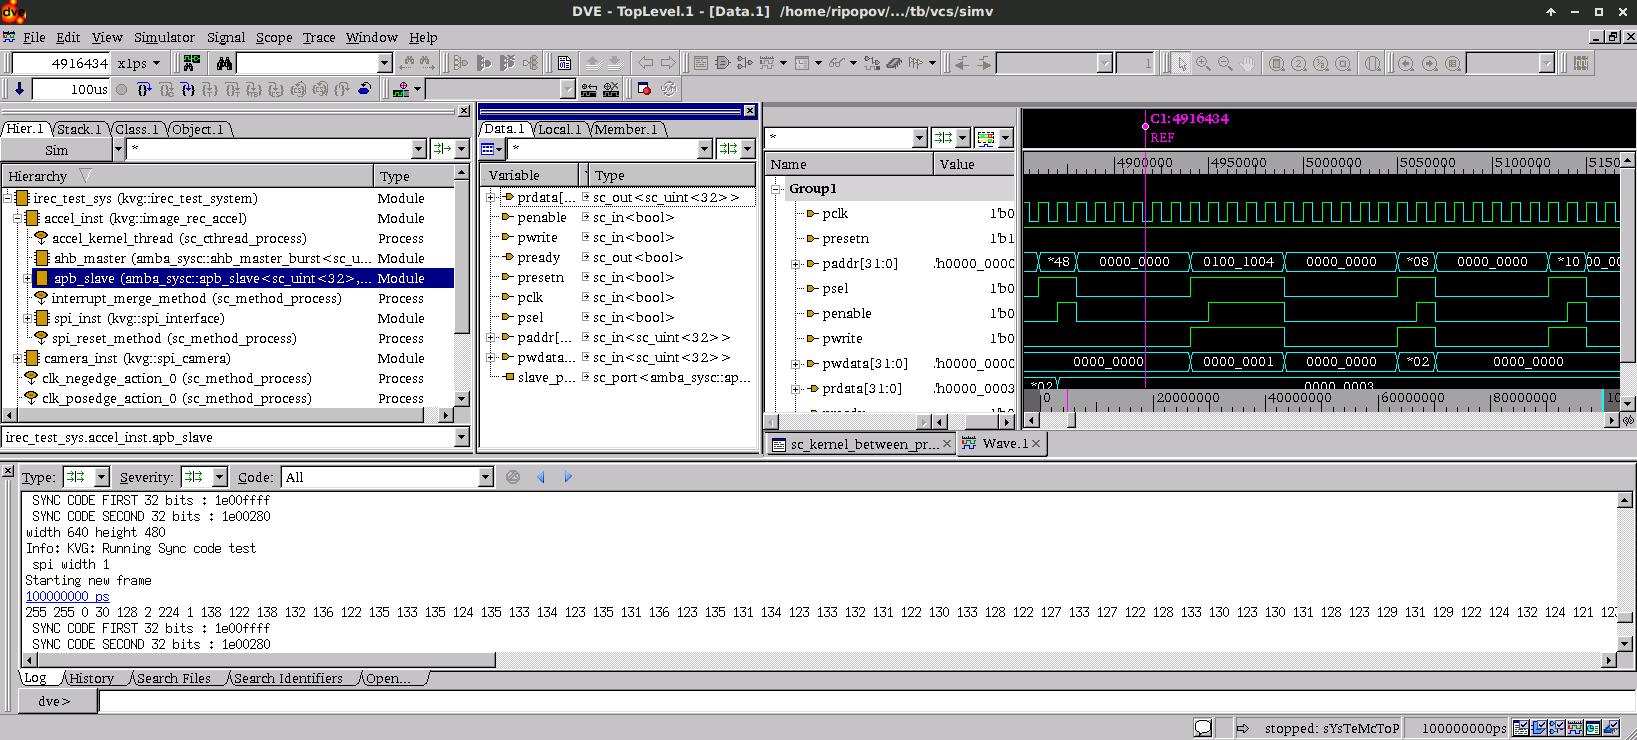 Разработка цифровой аппаратуры на C++-SystemC глазами SystemVerilog программиста - 4